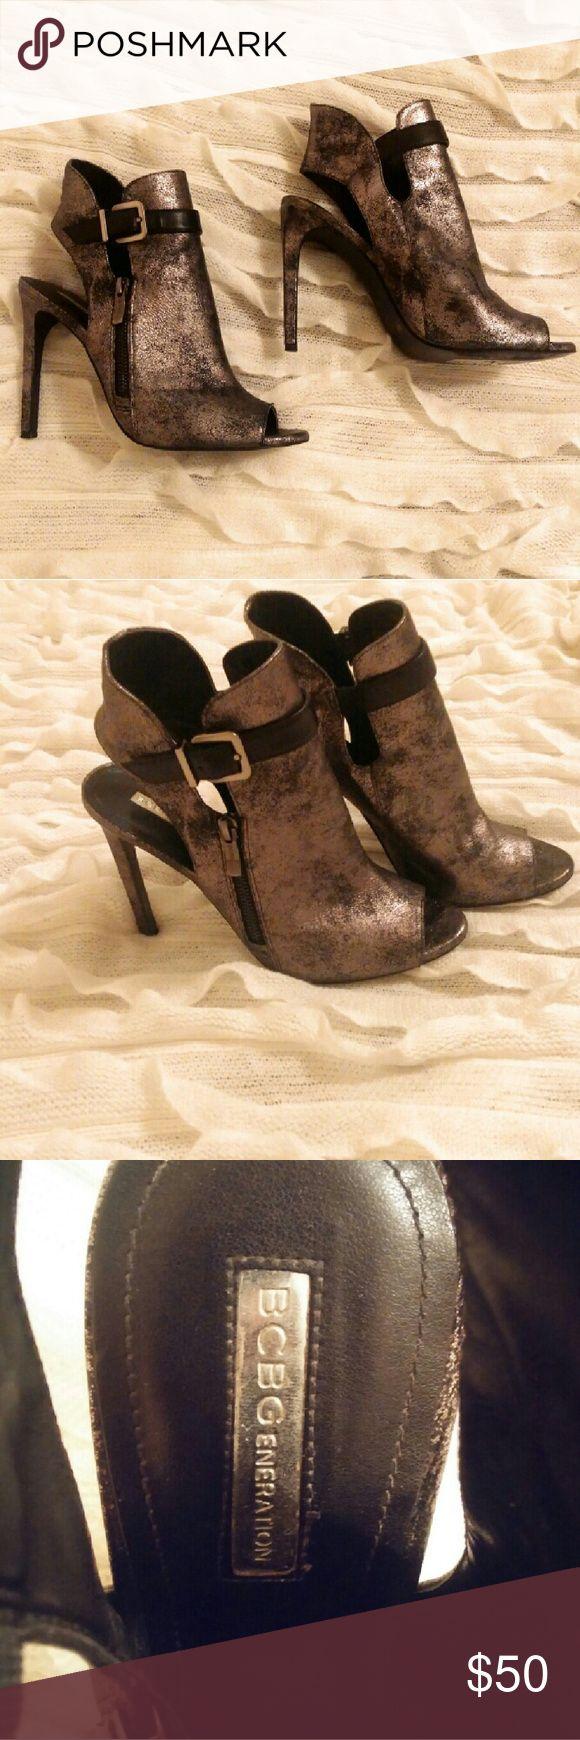 BCBG Metallic Navy Heels Metallic Navy Blue Heels, 9m Only worn 4 times; Love them but cannot wear high heels anymore BCBGeneration Shoes Heels